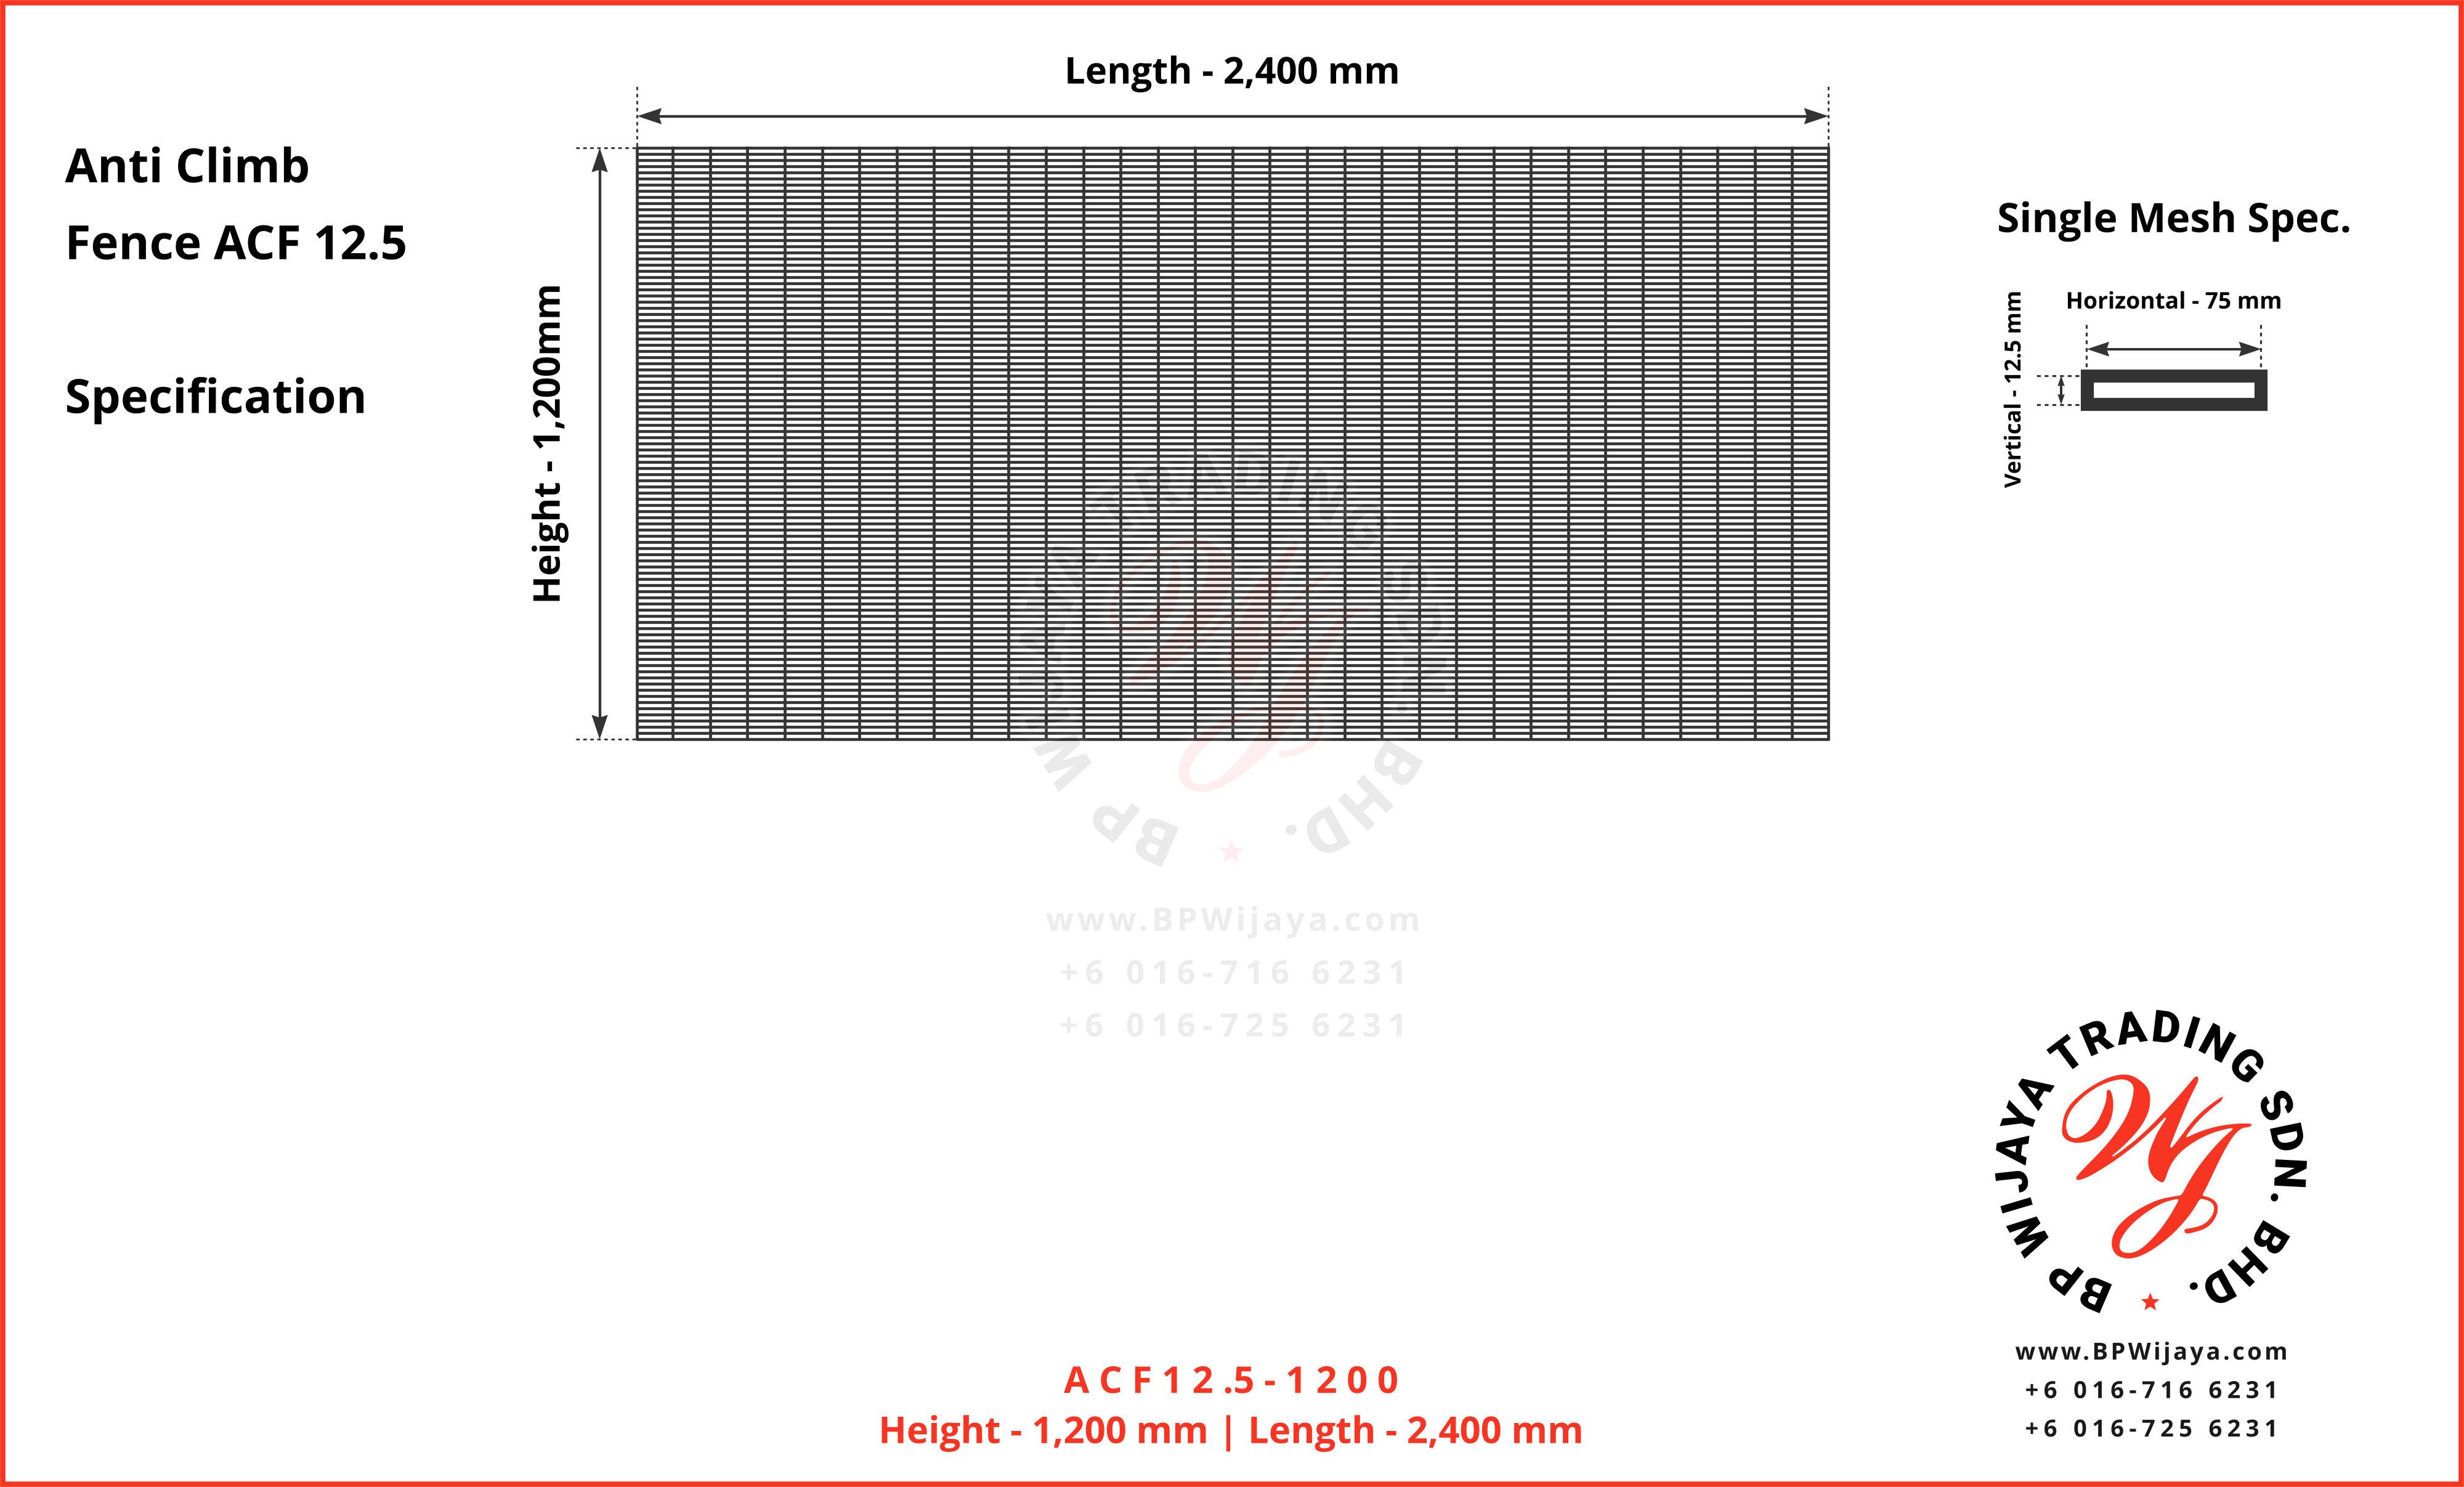 Anti-Climb Fence ACF 12.5 – BP WIJAYA TRADING SDN BHD